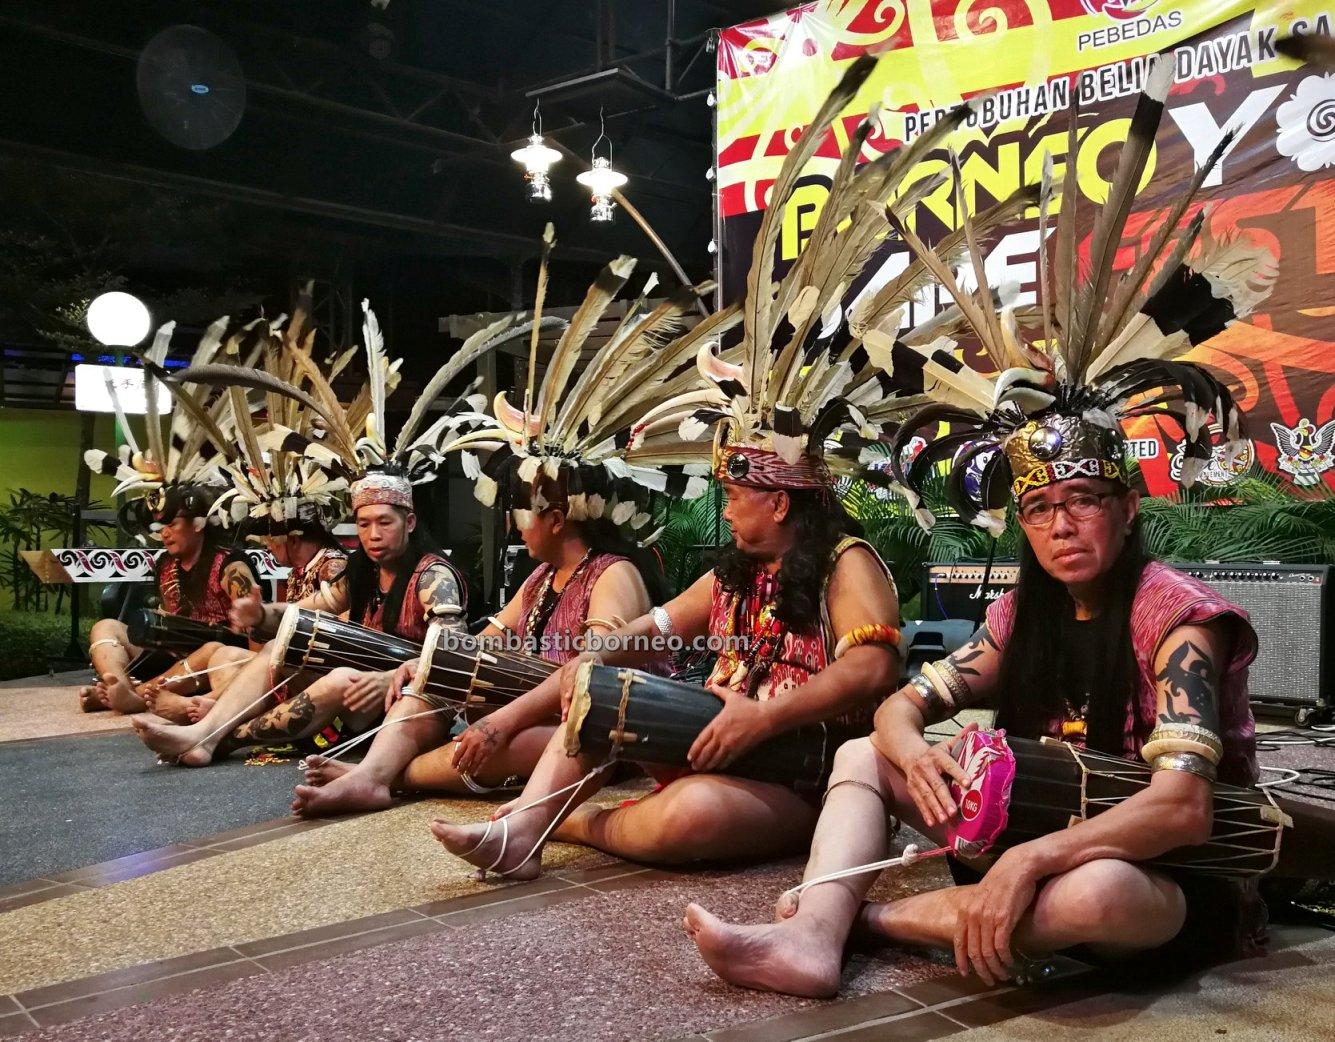 Borneo Youth Sape Festival, authentic, traditional, culture, Ethnic, native, tribal, orang ulu, Sibu, Sarawak, One Malaysia Cultural Village, Tourism, tourist attraction, travel guide, Trans Border,